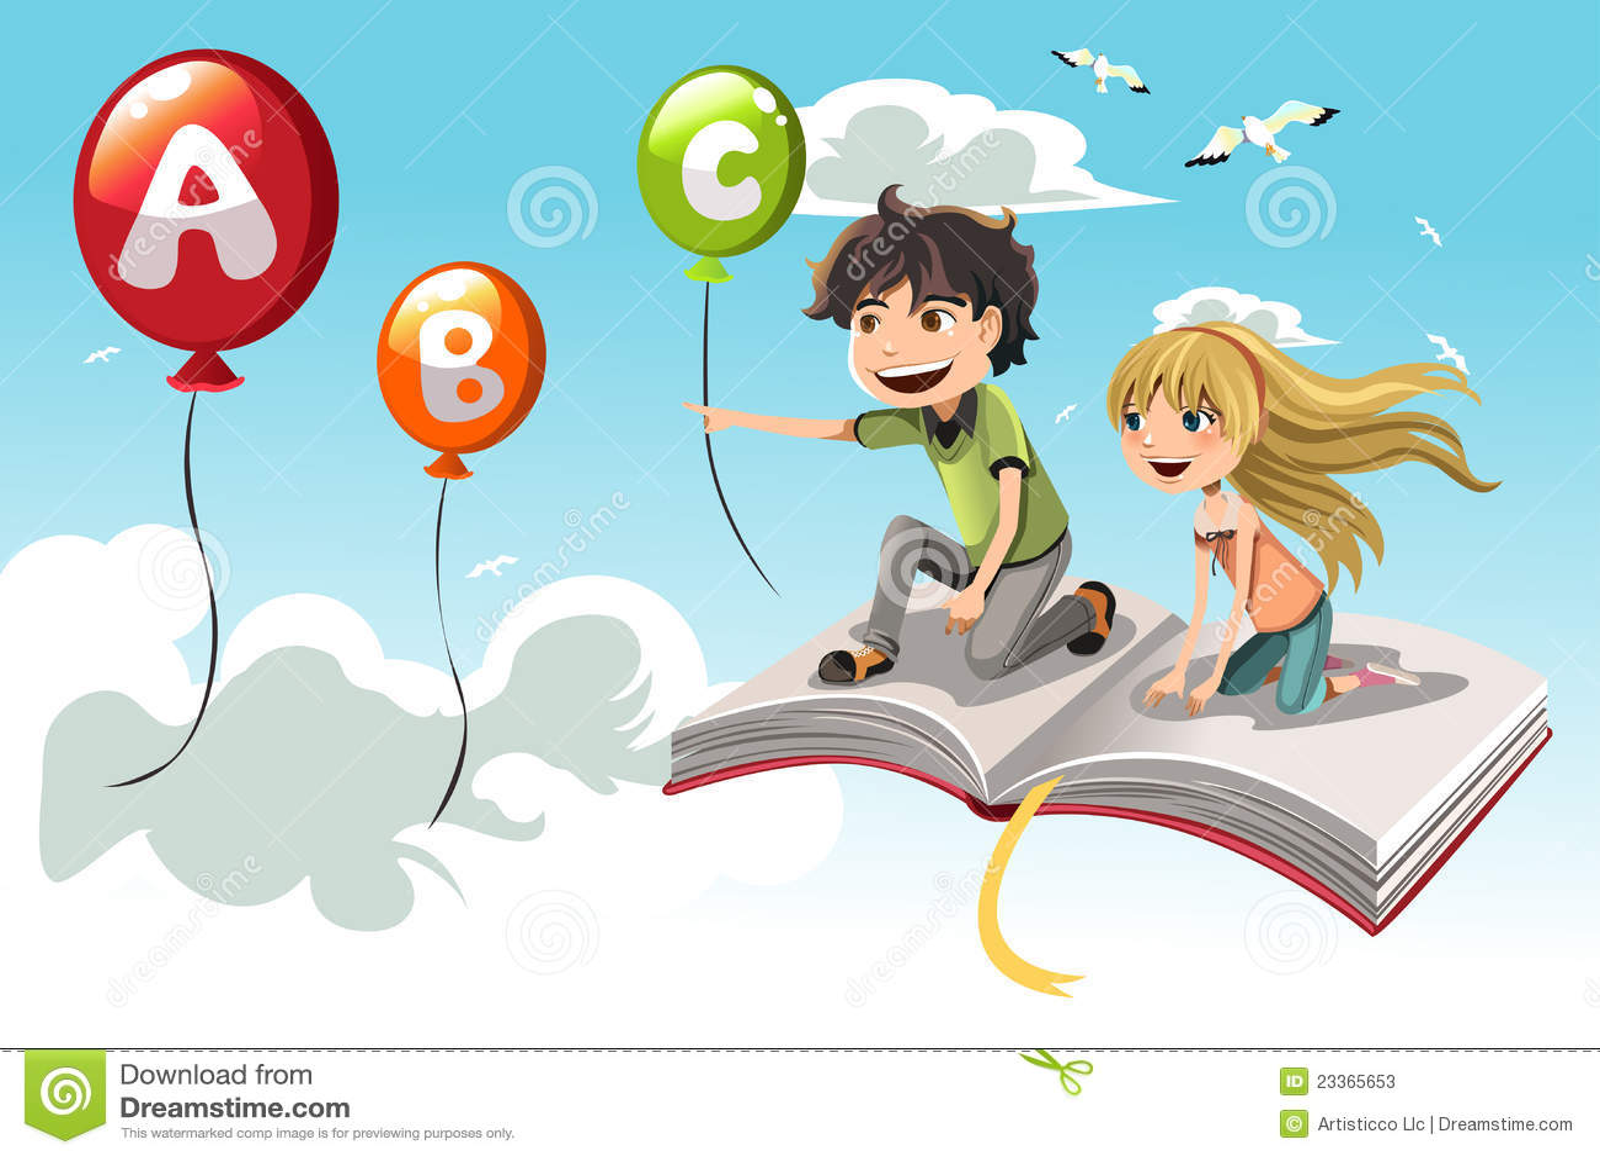 worksheet Learning For Kids learning kids stock photos image 23365653 kids